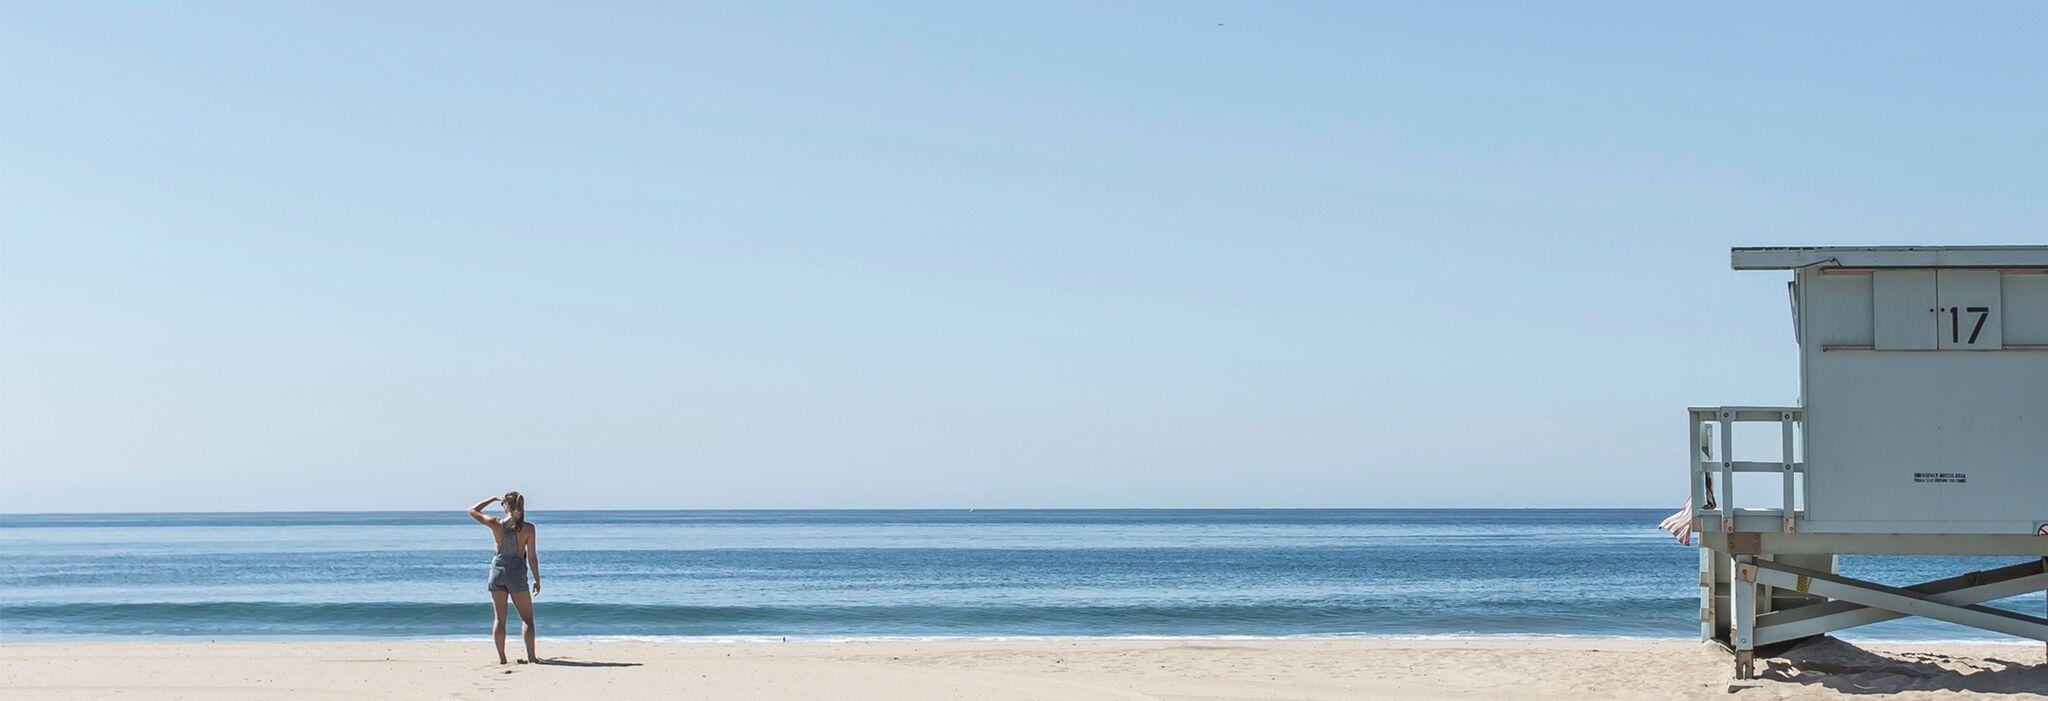 beach-post